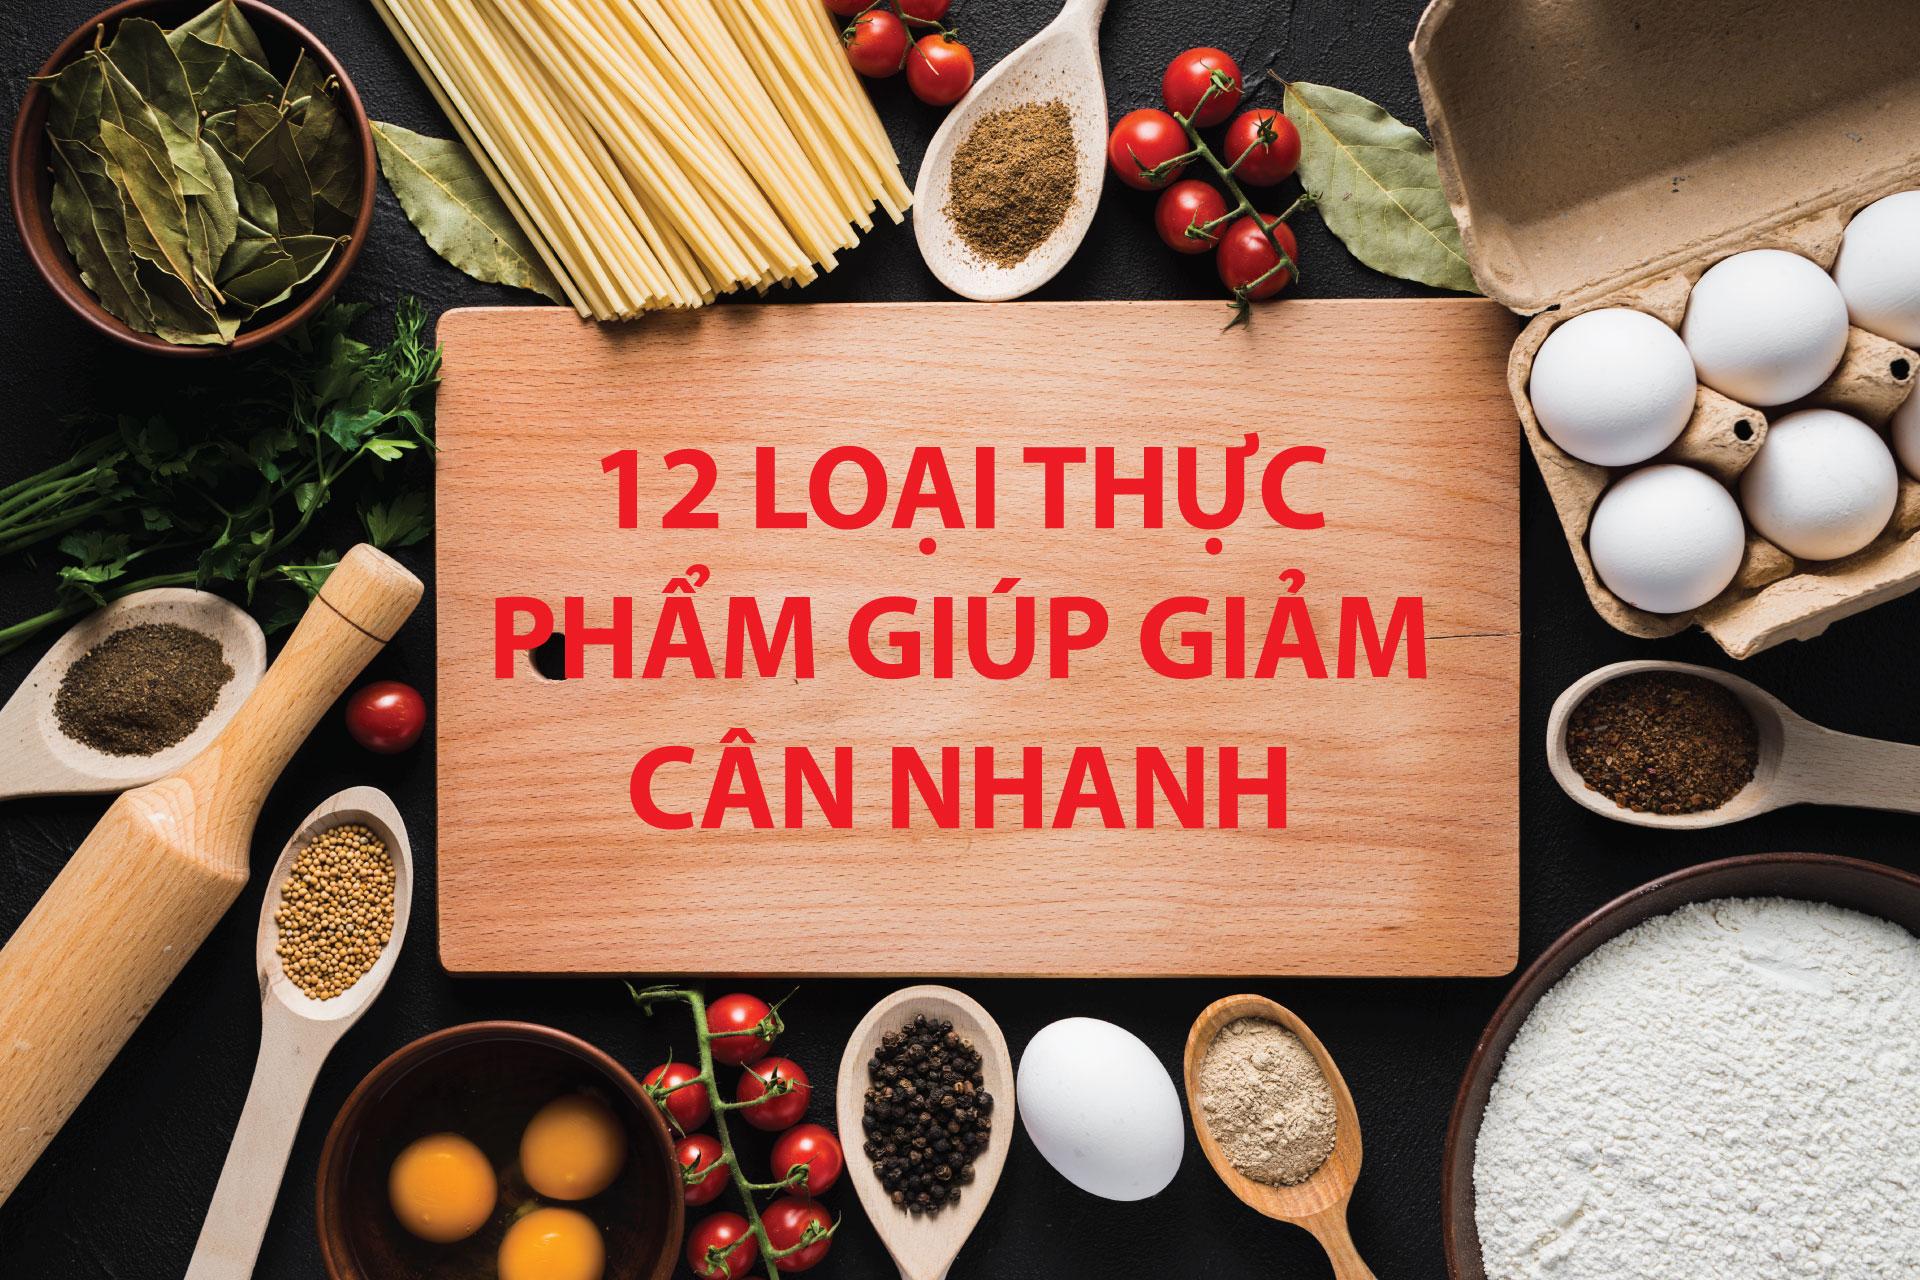 12-loai-thuc-pham-giup-giam-can-nhanh